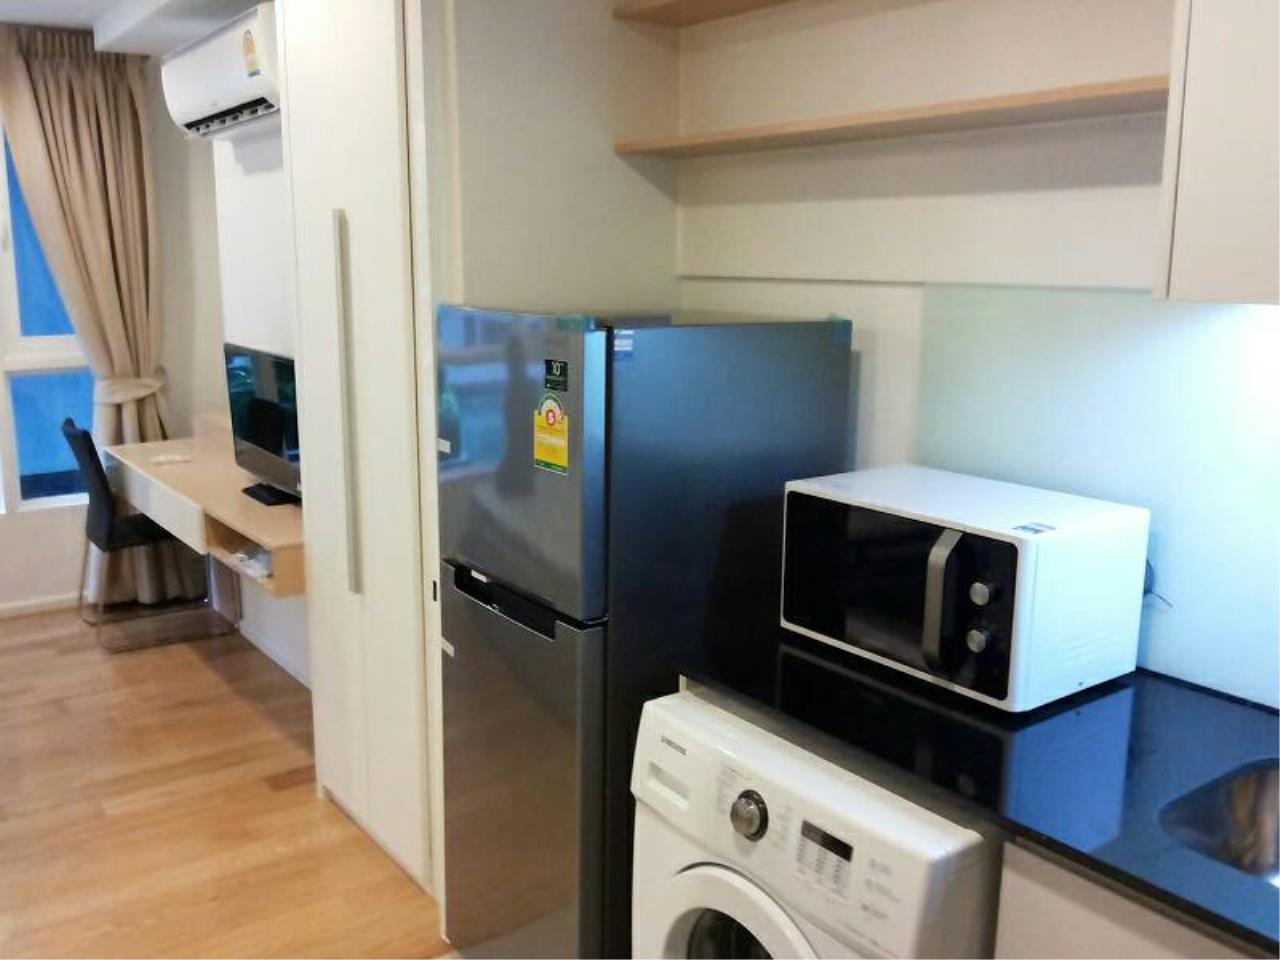 Quality Life Property Agency's FOR RENT! !! 15 SUKHUMVIT RESIDENCES / STUDIO 1 BETHROOM /  10 FLOOR 4